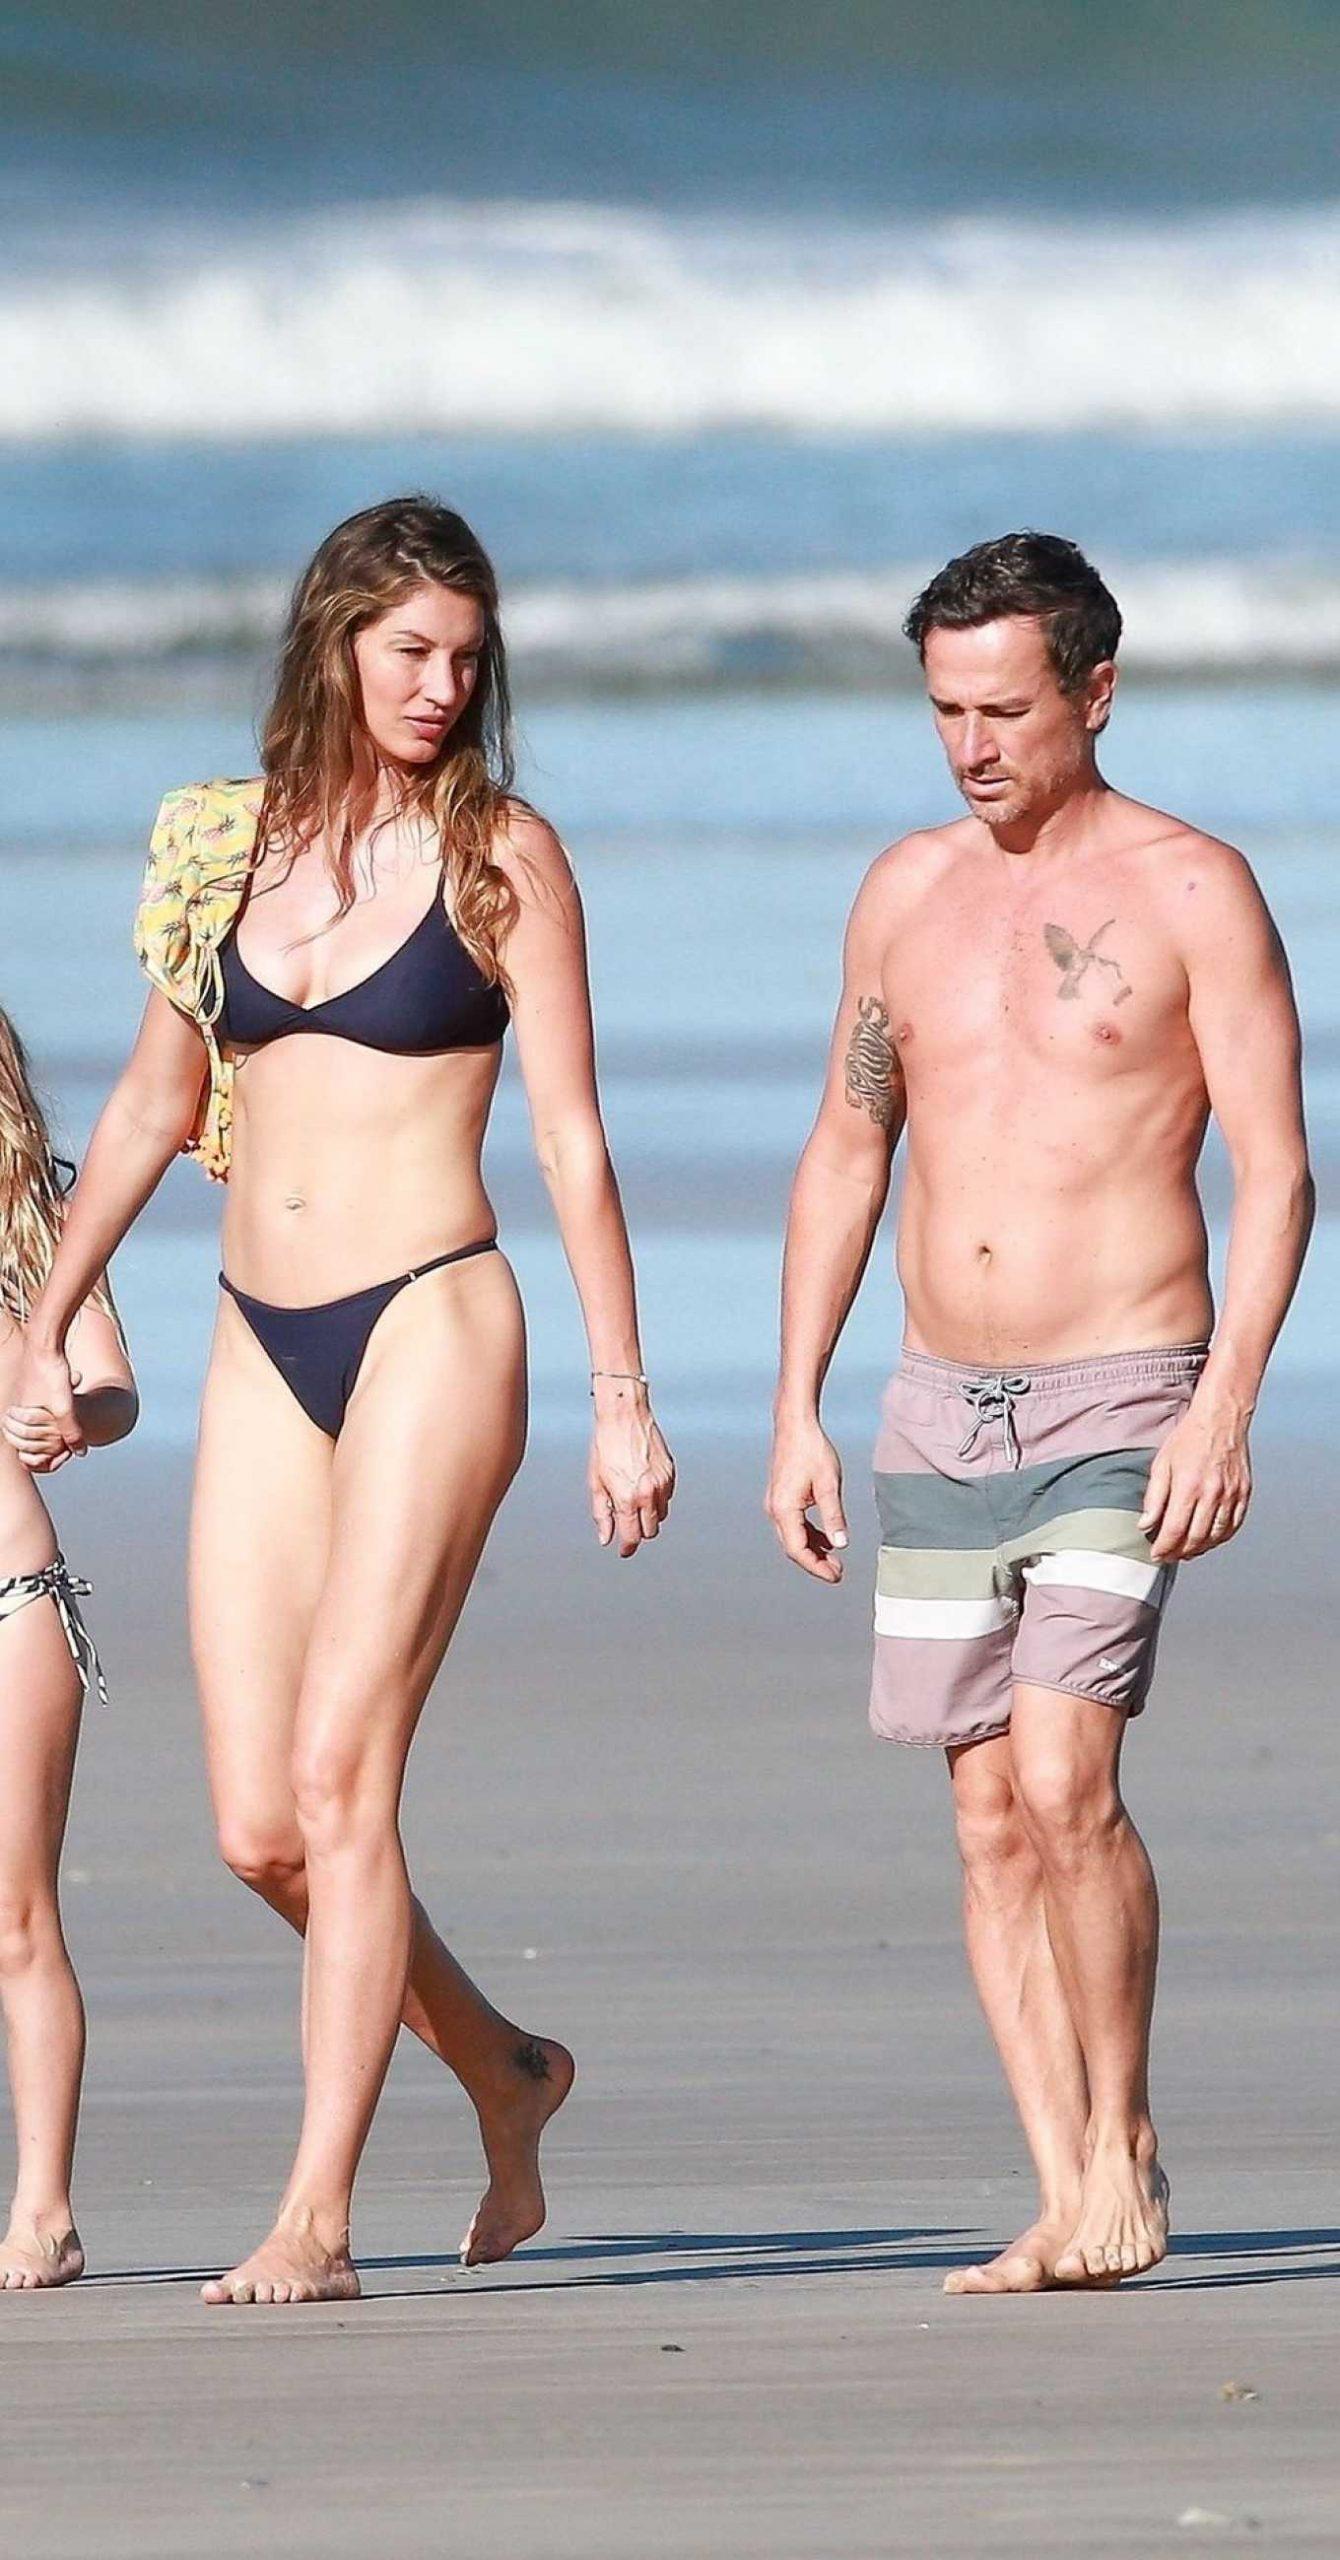 Gisele Bundchen in Black Bikini - Takes a Morning Walk on the Beach in Costa Rica